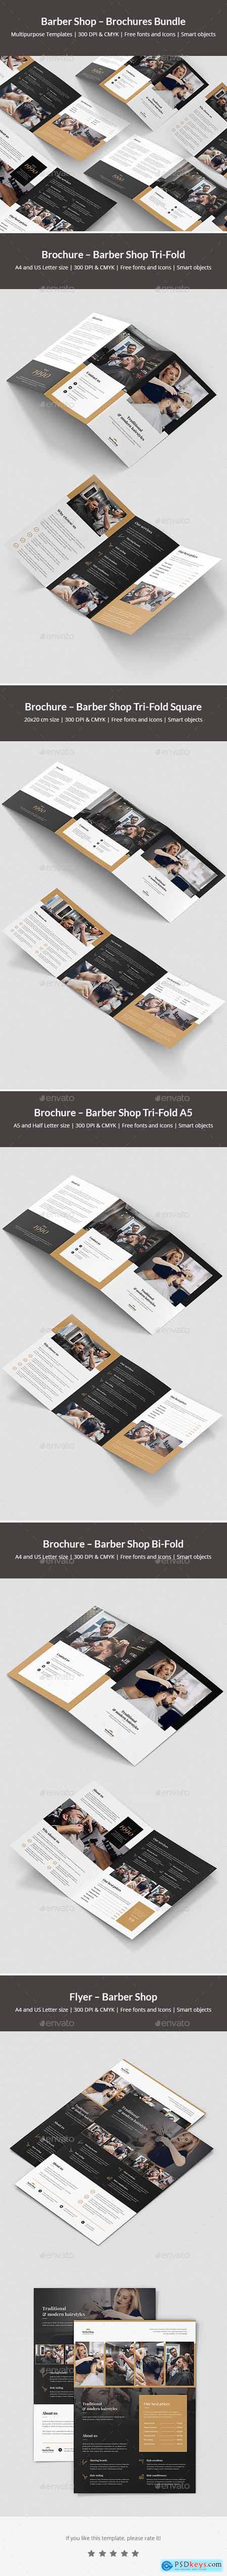 Barber Shop – Brochures Bundle Print Templates 5 in 1 24036407